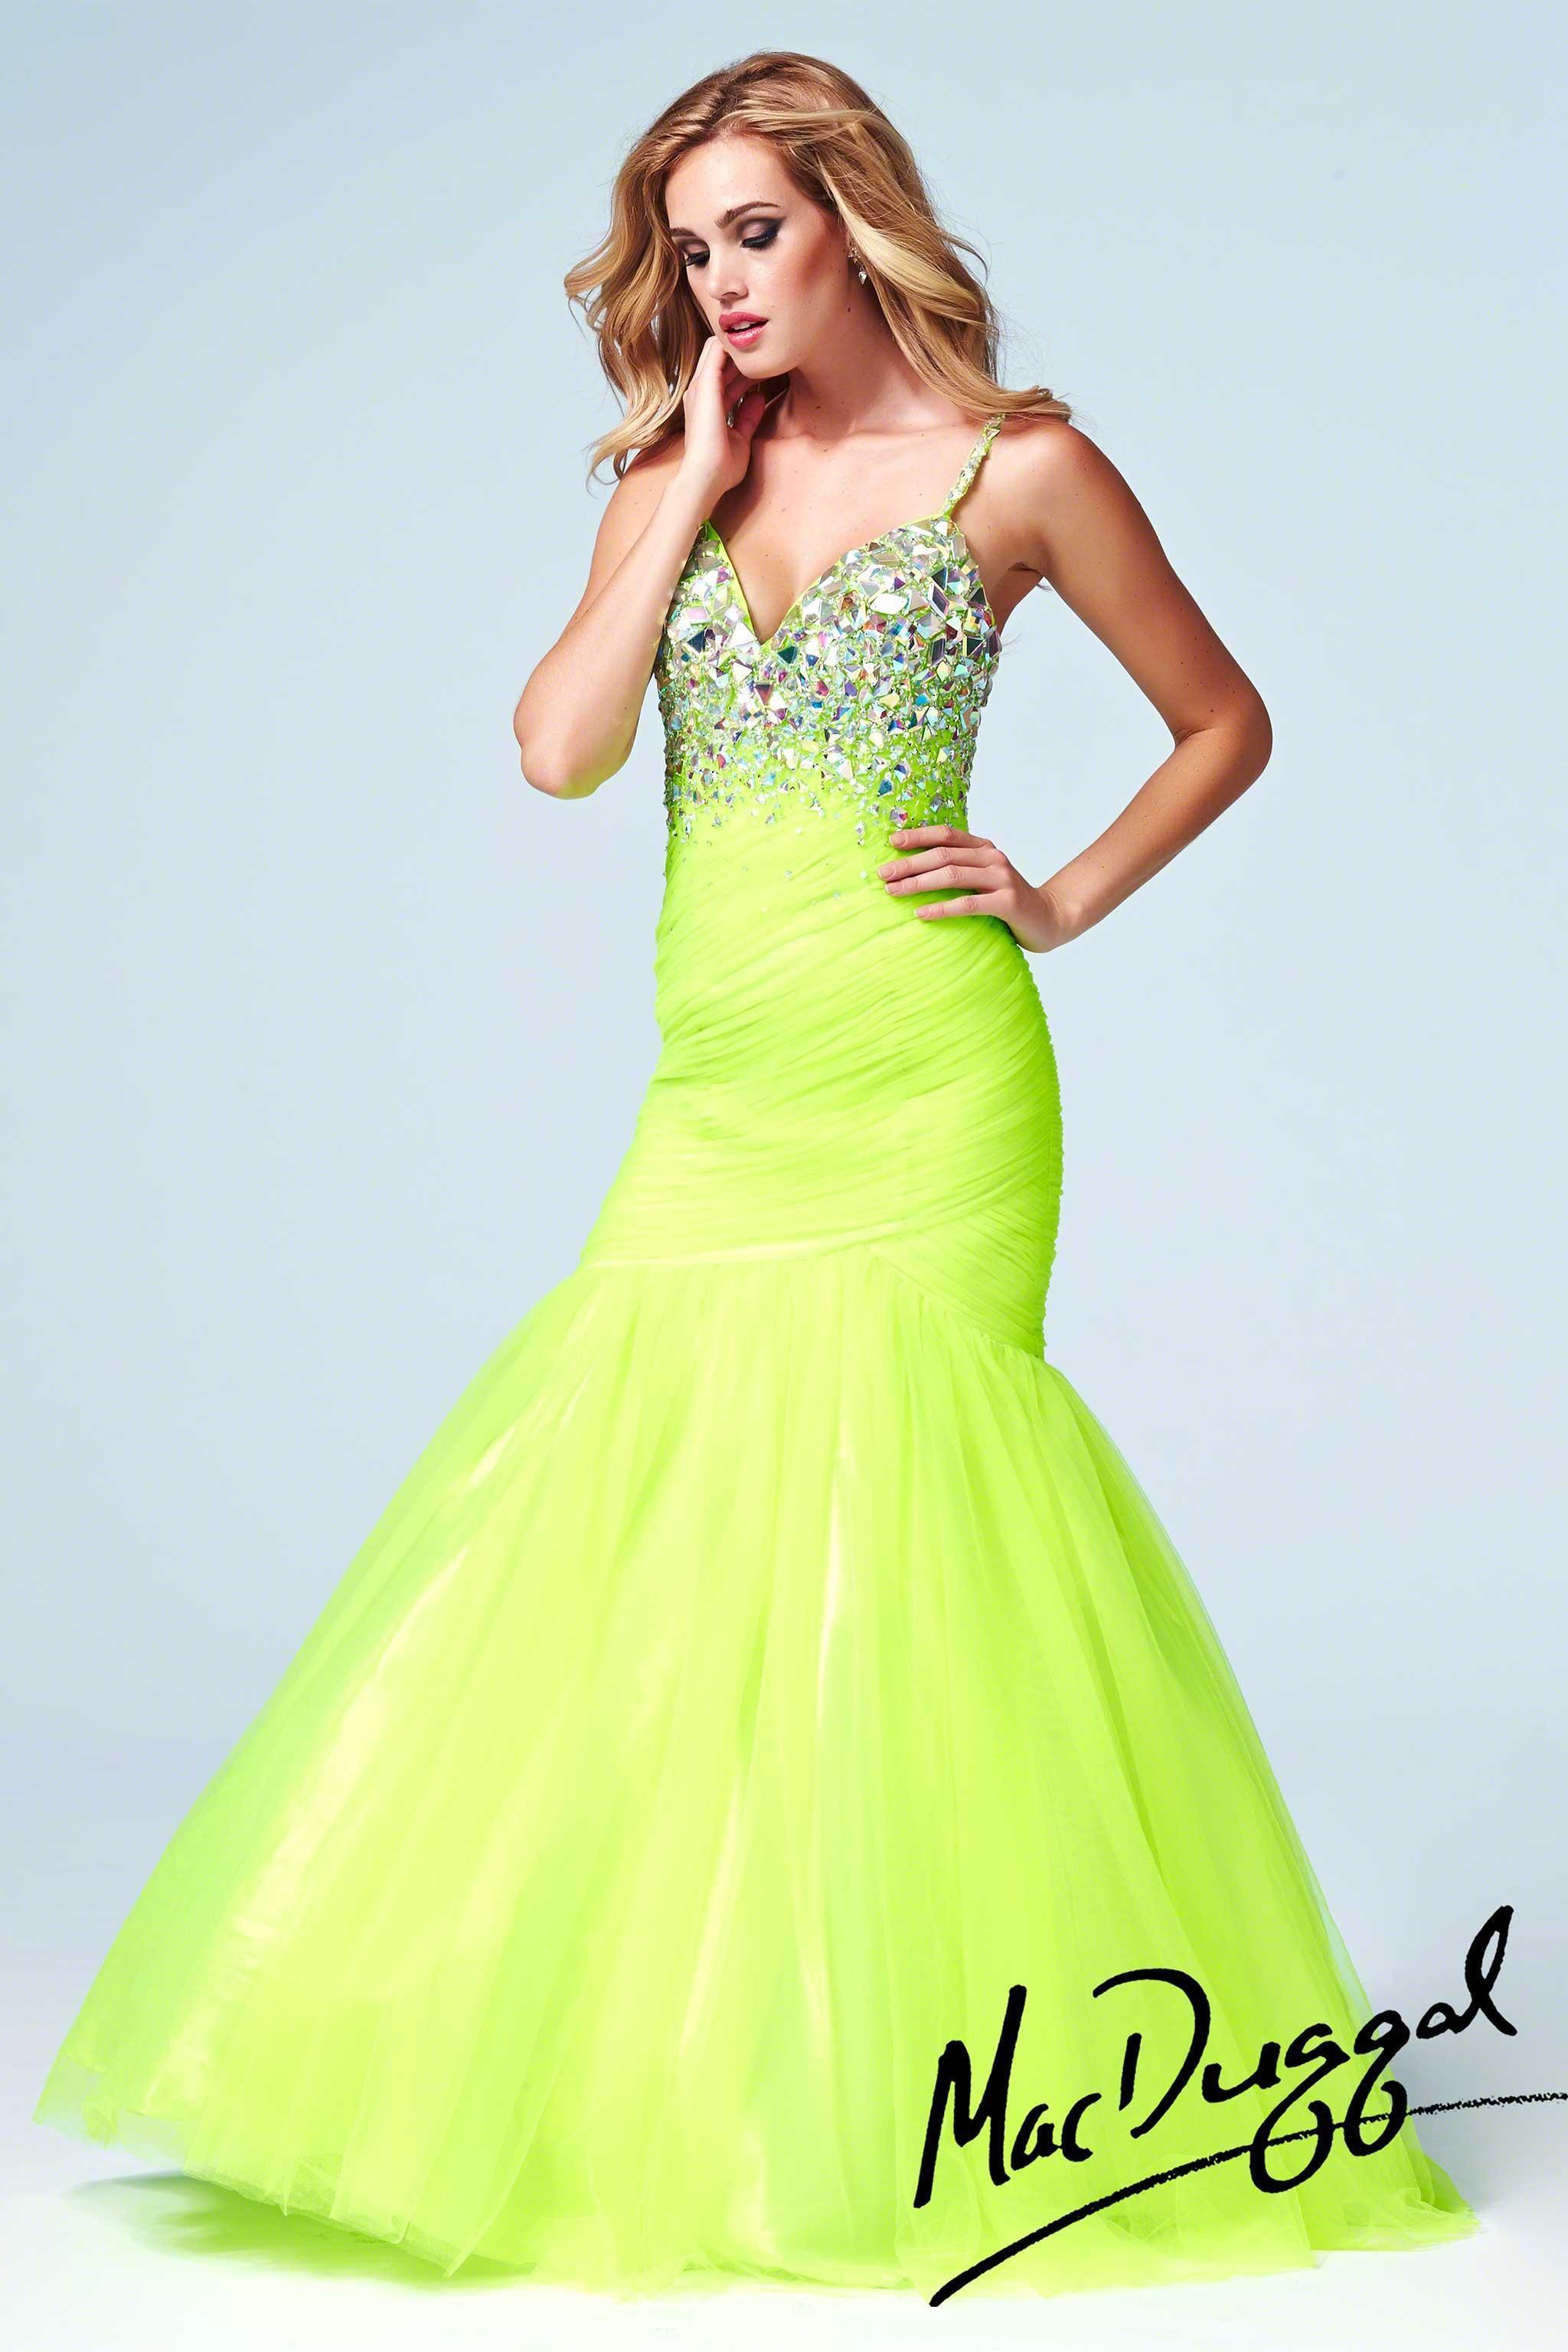 Neon Lime Green Mermaid Cassandra Stone Mac Duggal Prom Gown | Prom ...